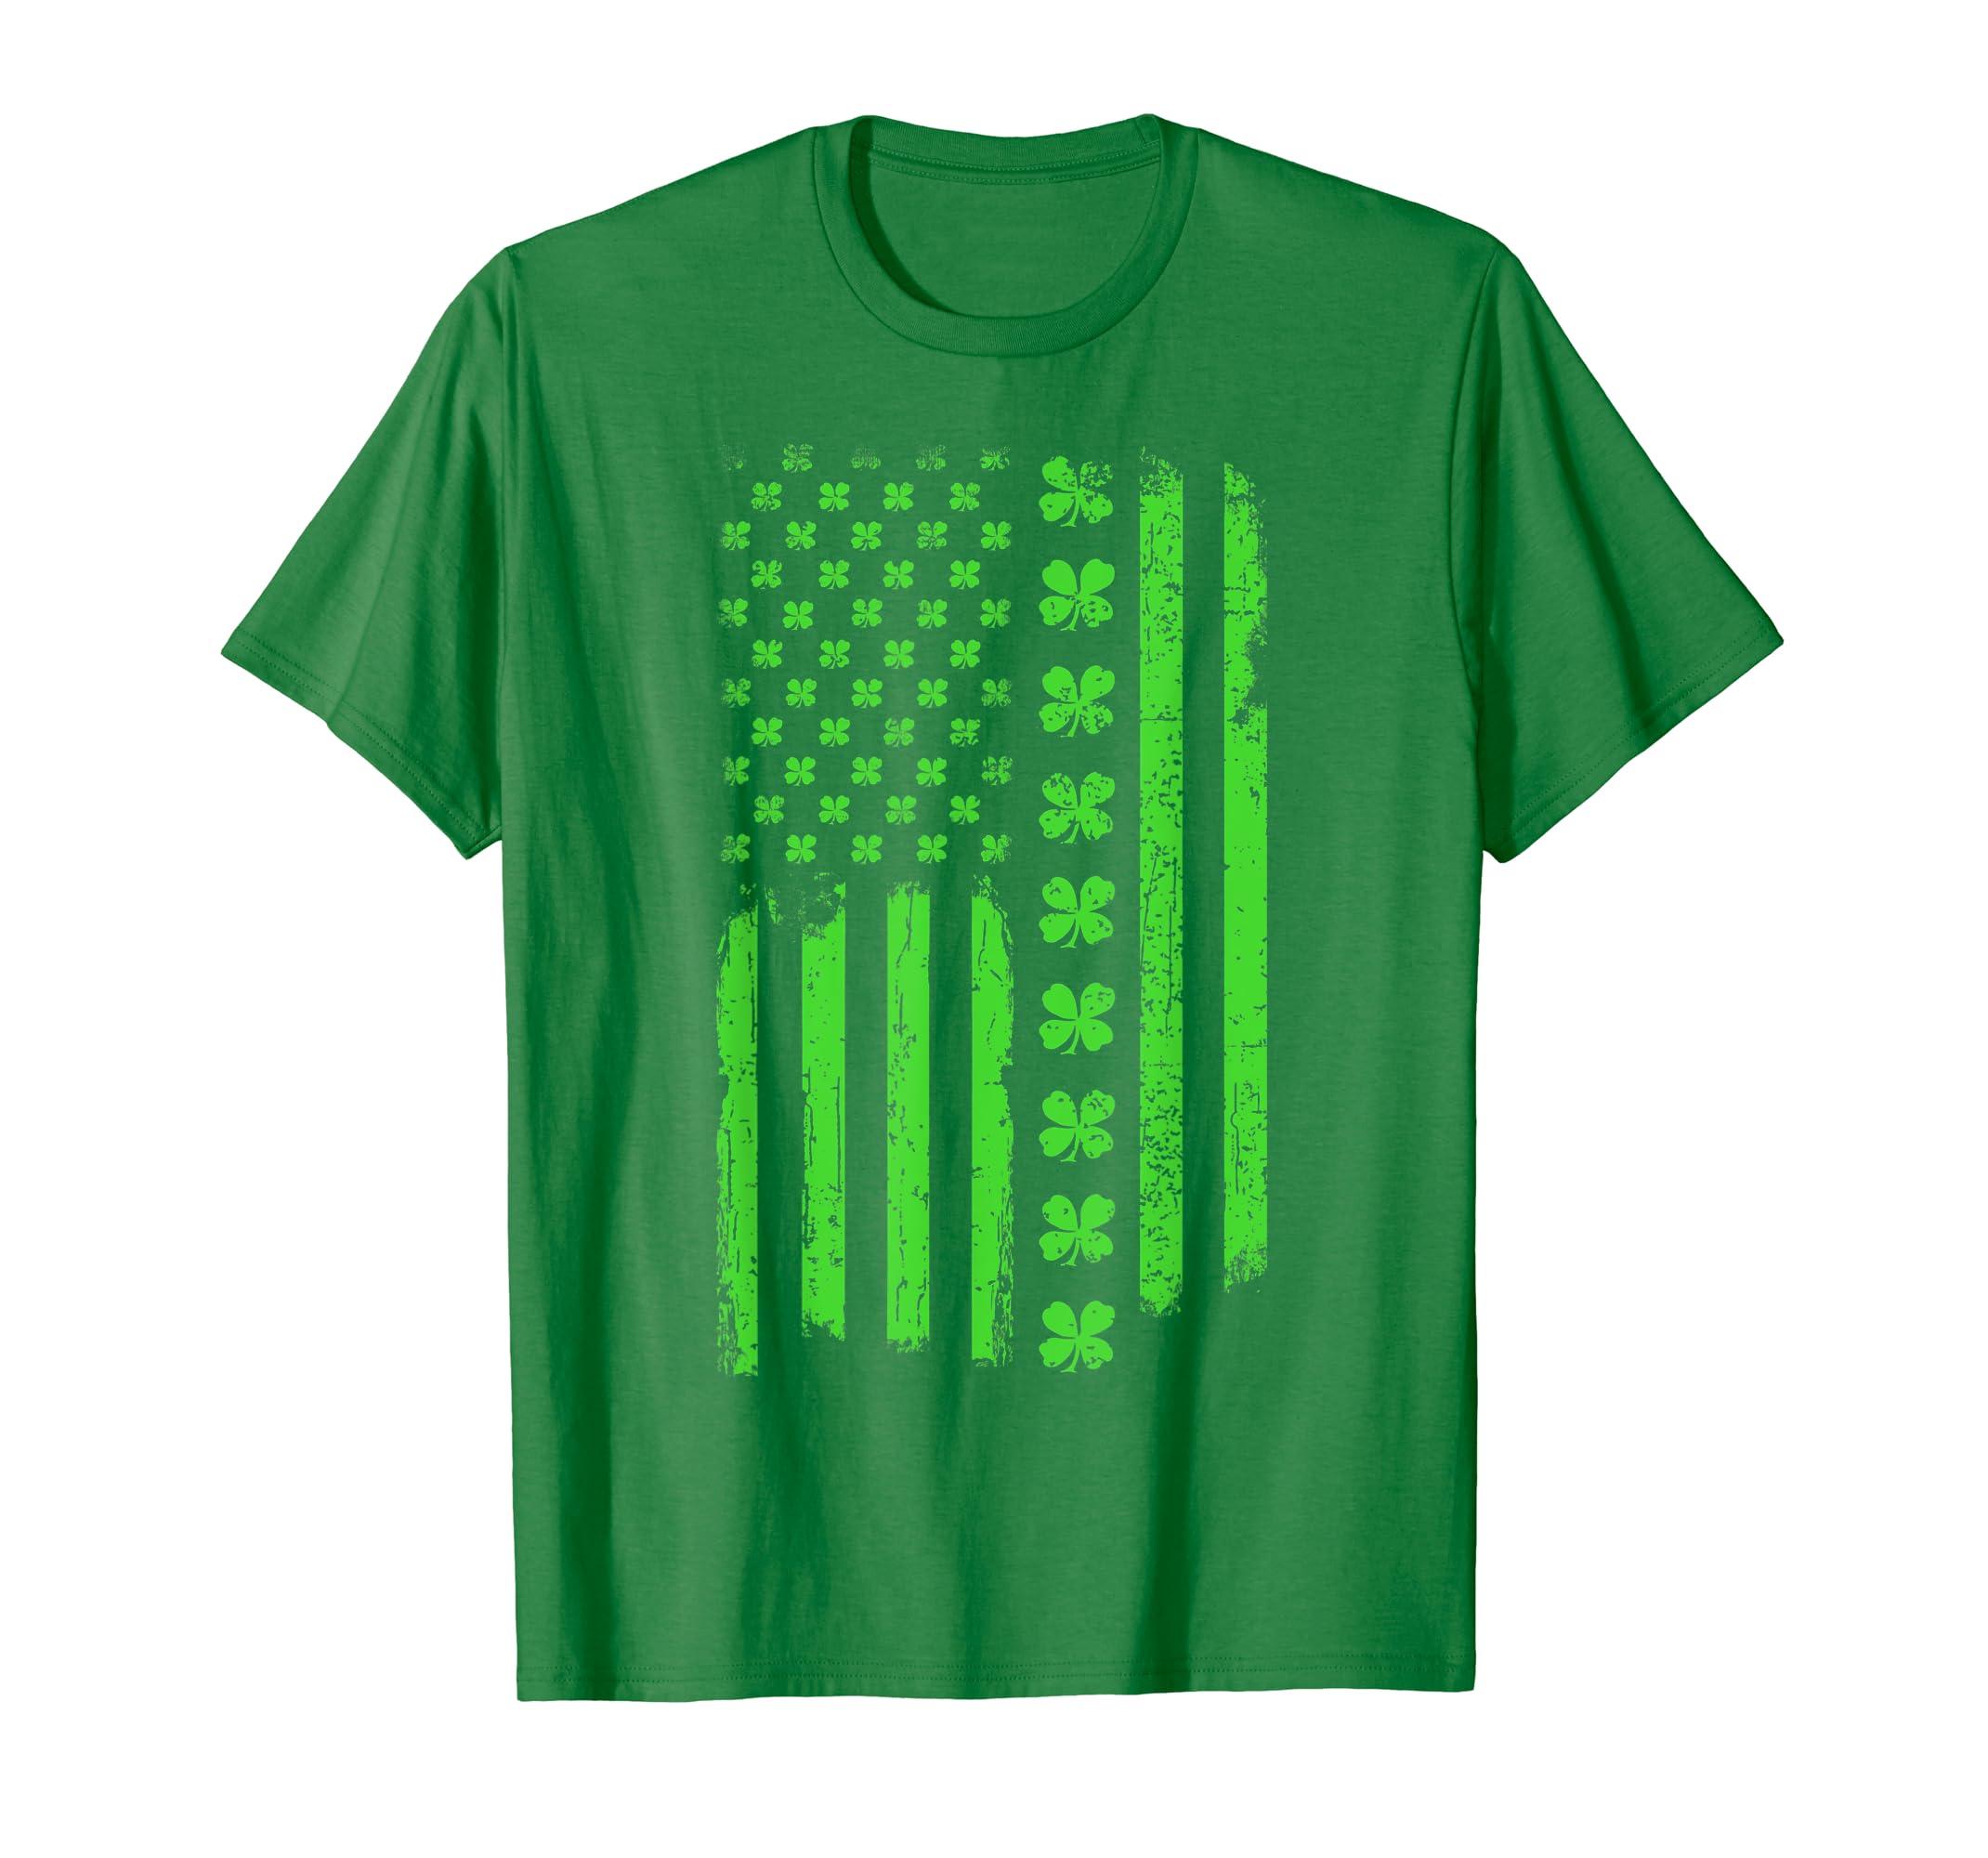 d0d3e5d0 Amazon.com: St Patricks Day Irish American Flag T-Shirt: Clothing